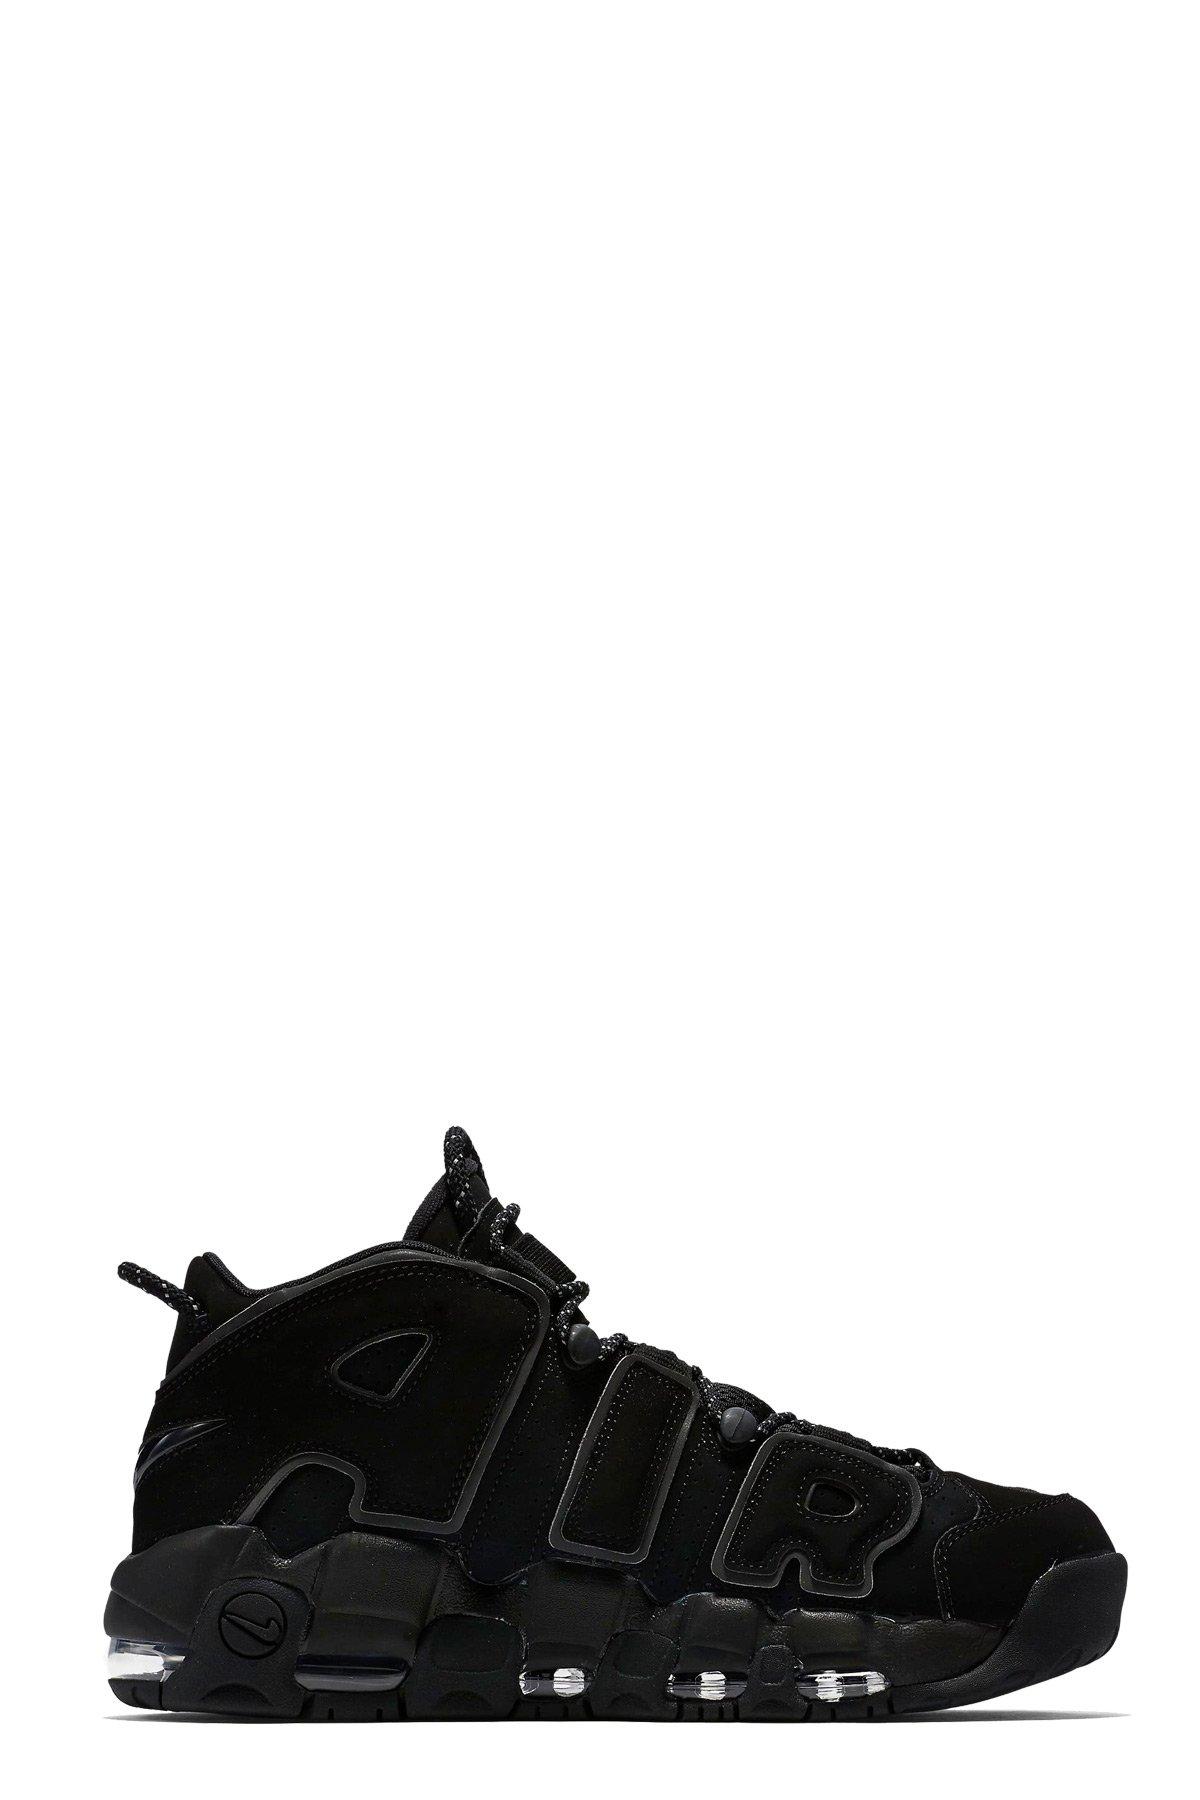 42d49573b61d Galleon - NIKE Men s Air More Uptempo Black 414962-004 (Size  12)